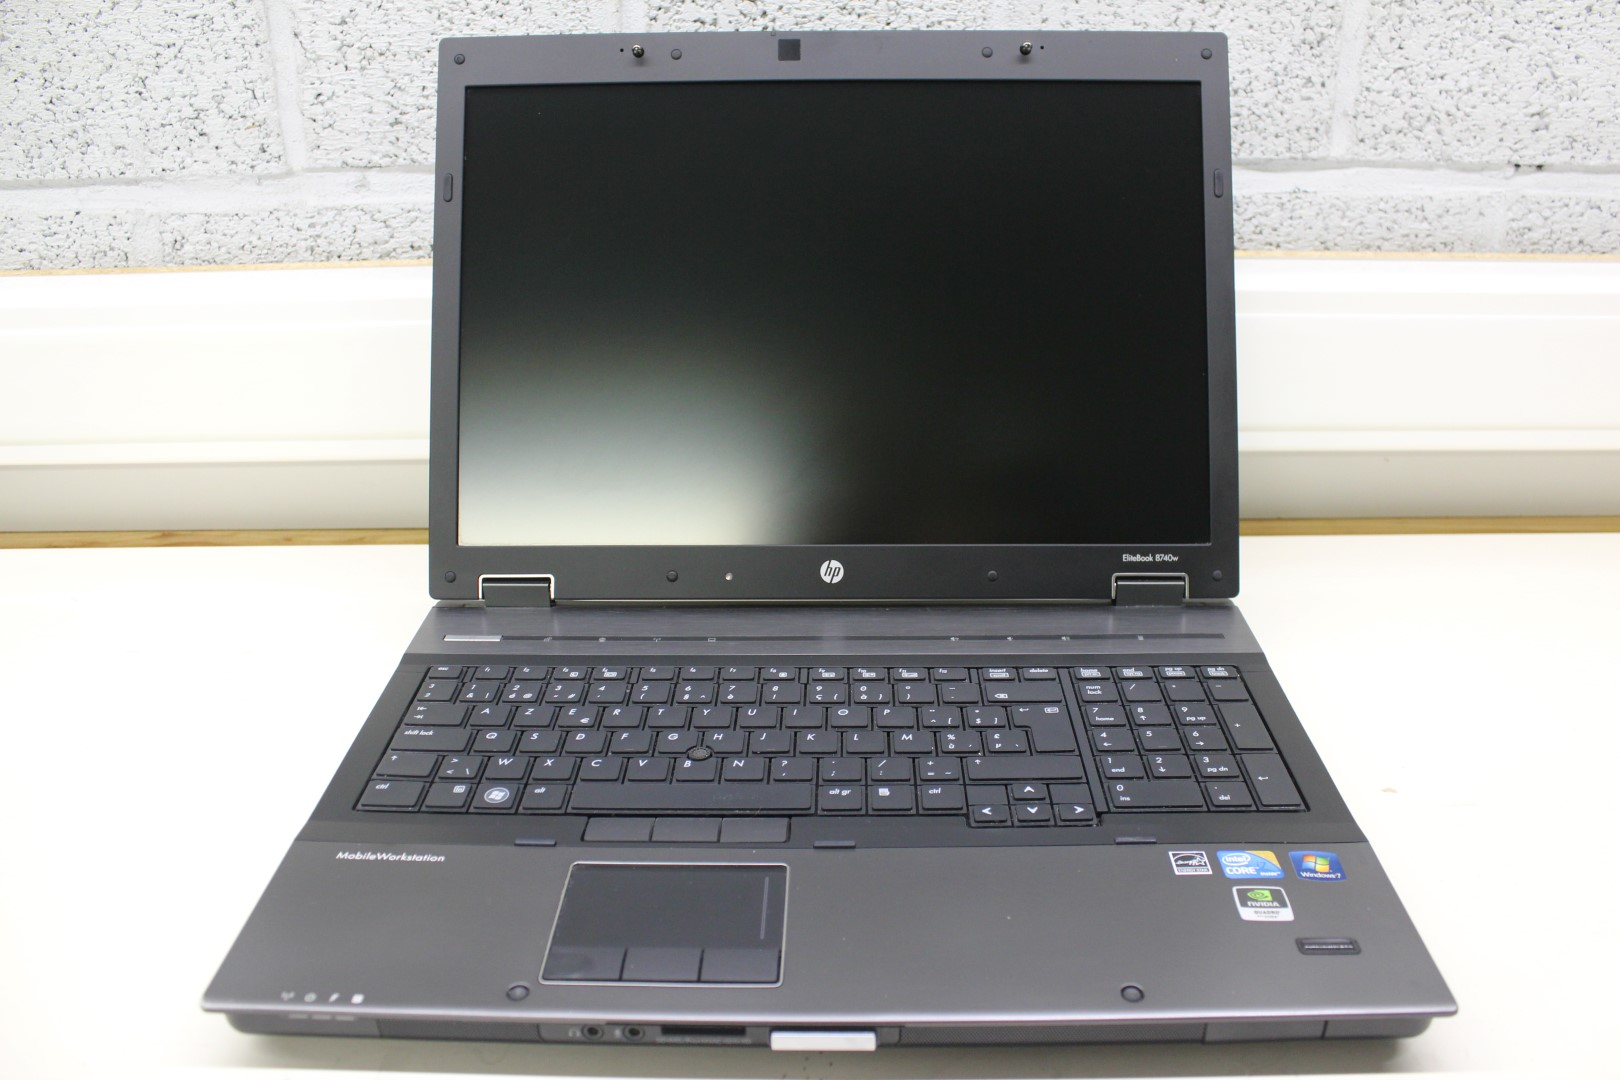 HP ELITEBOOK 8740W MOBILE WORKSTATION INTEL LAN WINDOWS 10 DOWNLOAD DRIVER